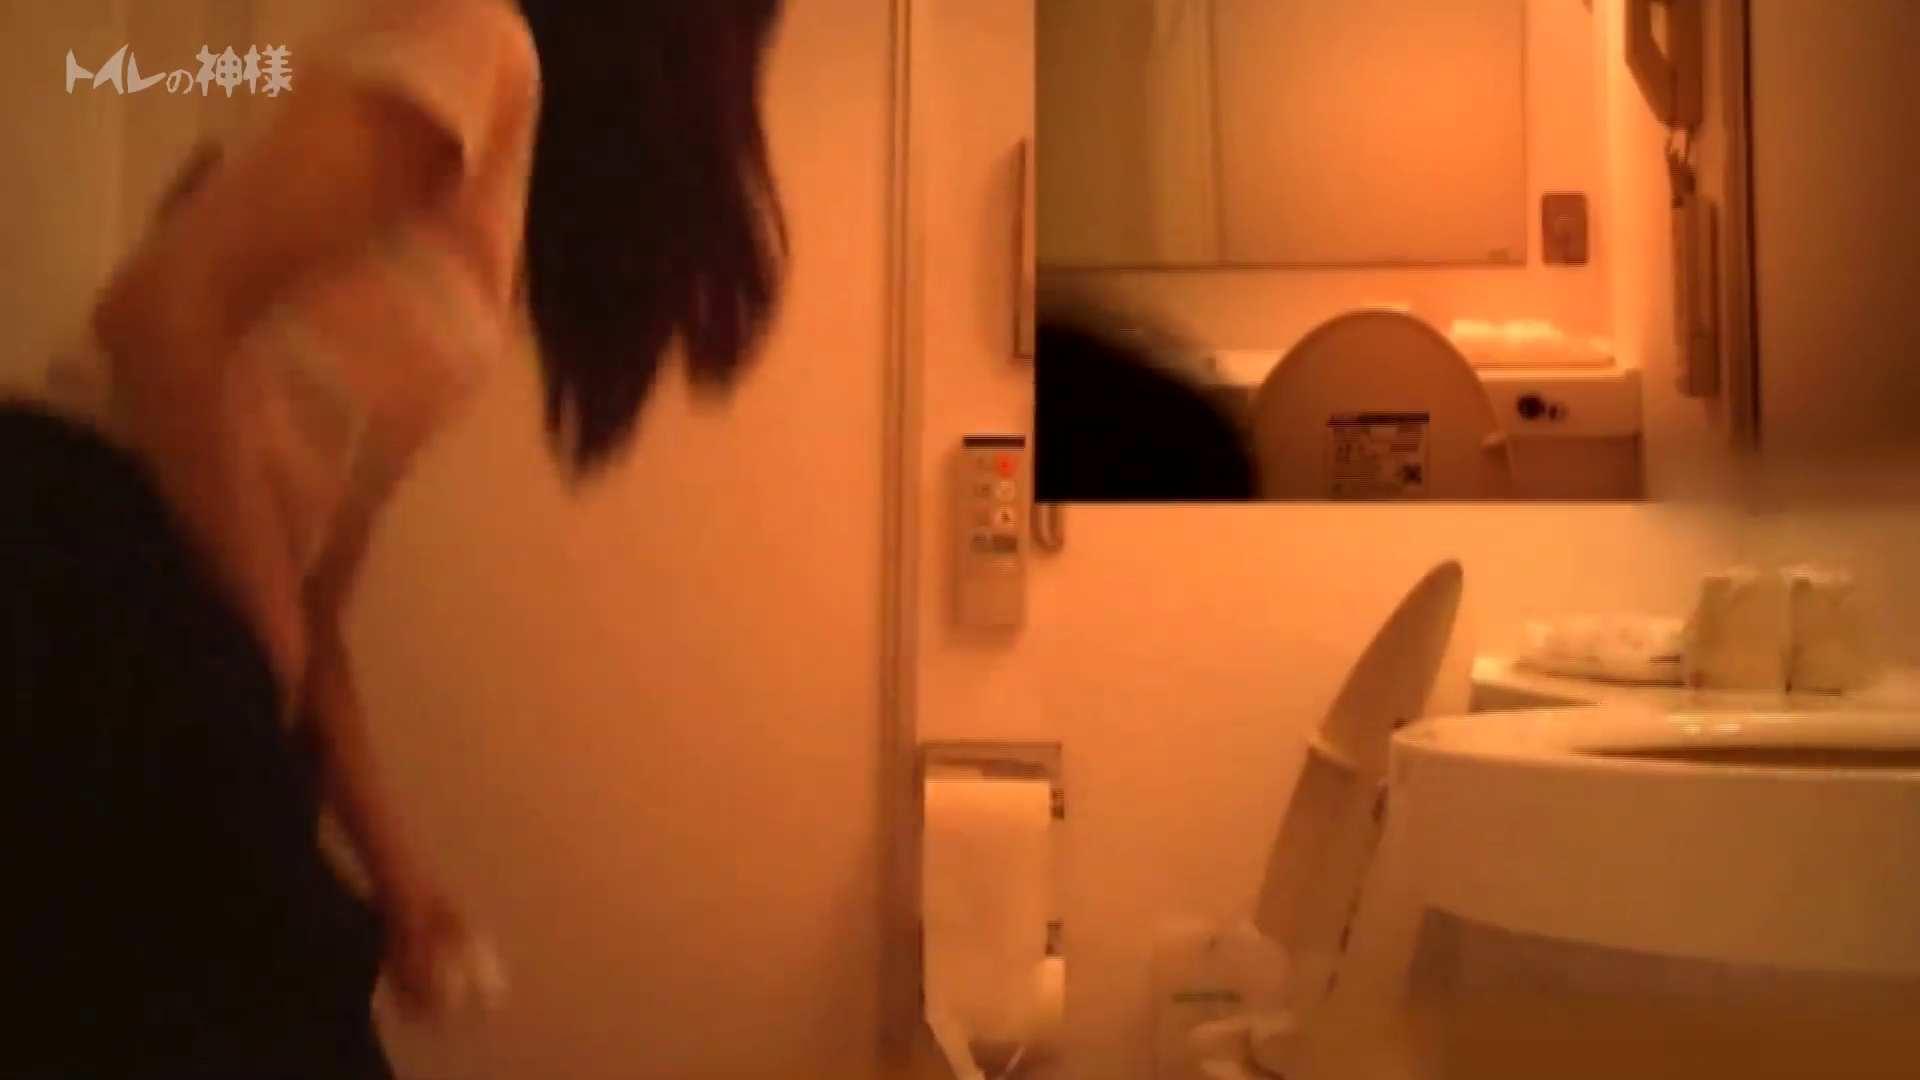 Vol.04 女子大生のトイレ恥態 OLハメ撮り  104Pix 74